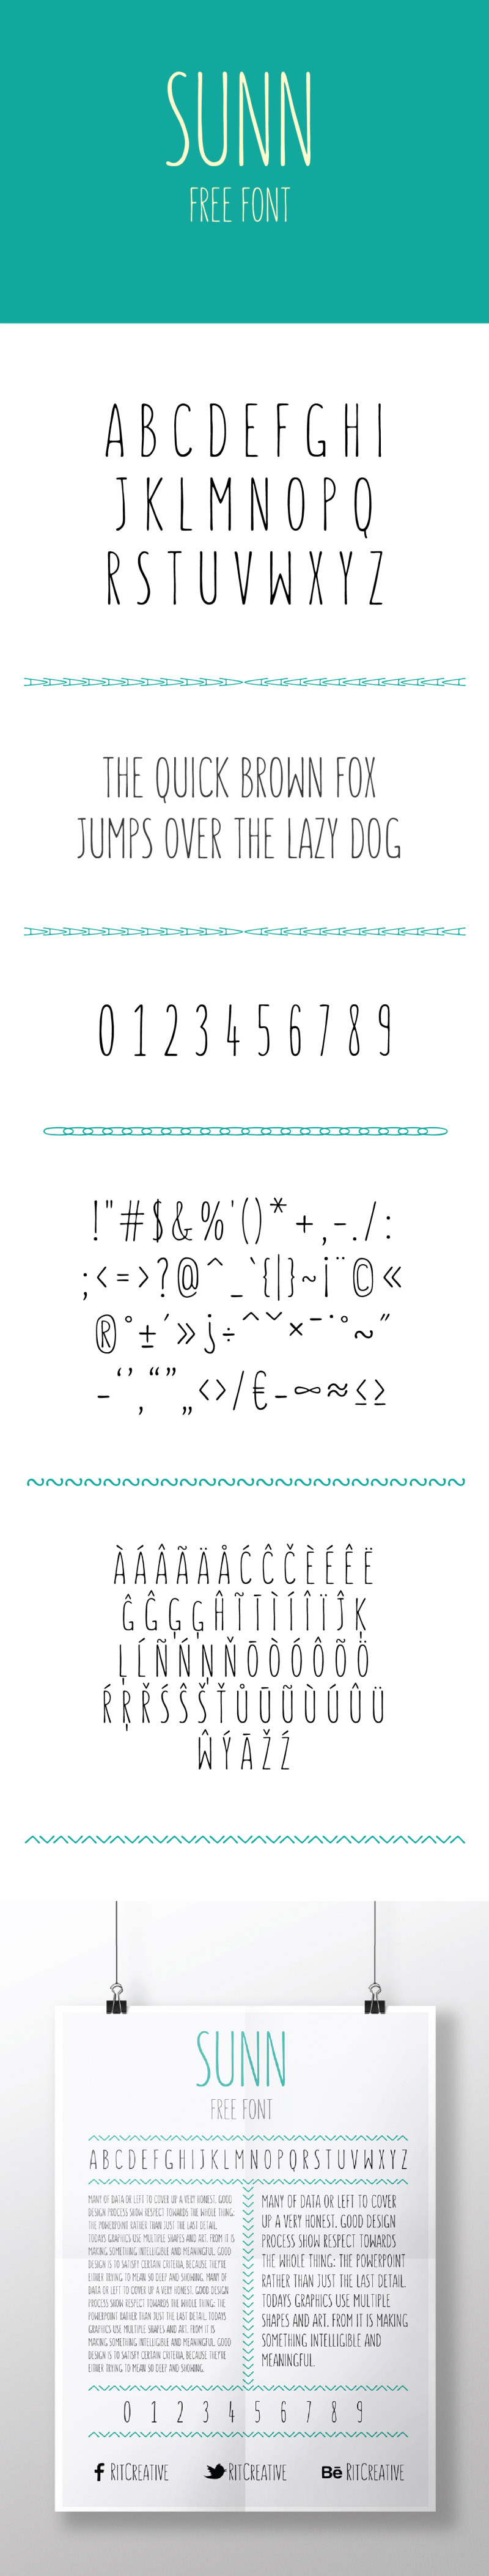 SUNN Free Font - WILDTYPE